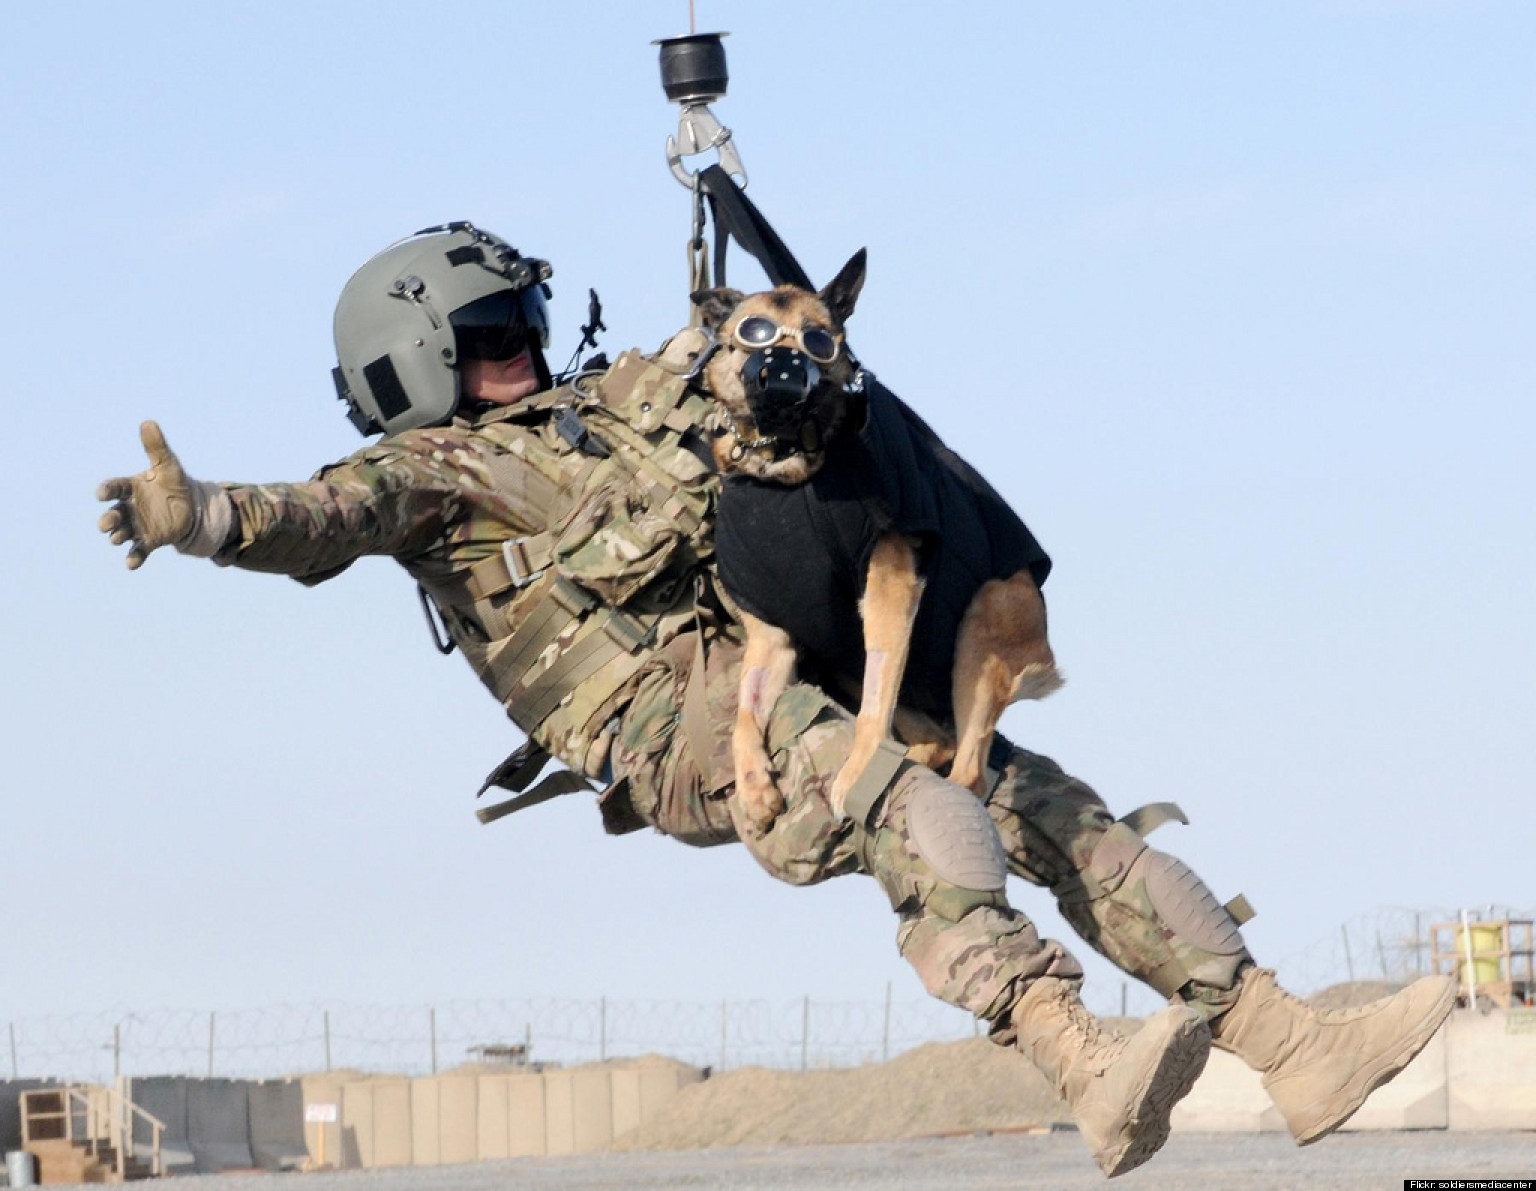 Military dog airborne - photo#1